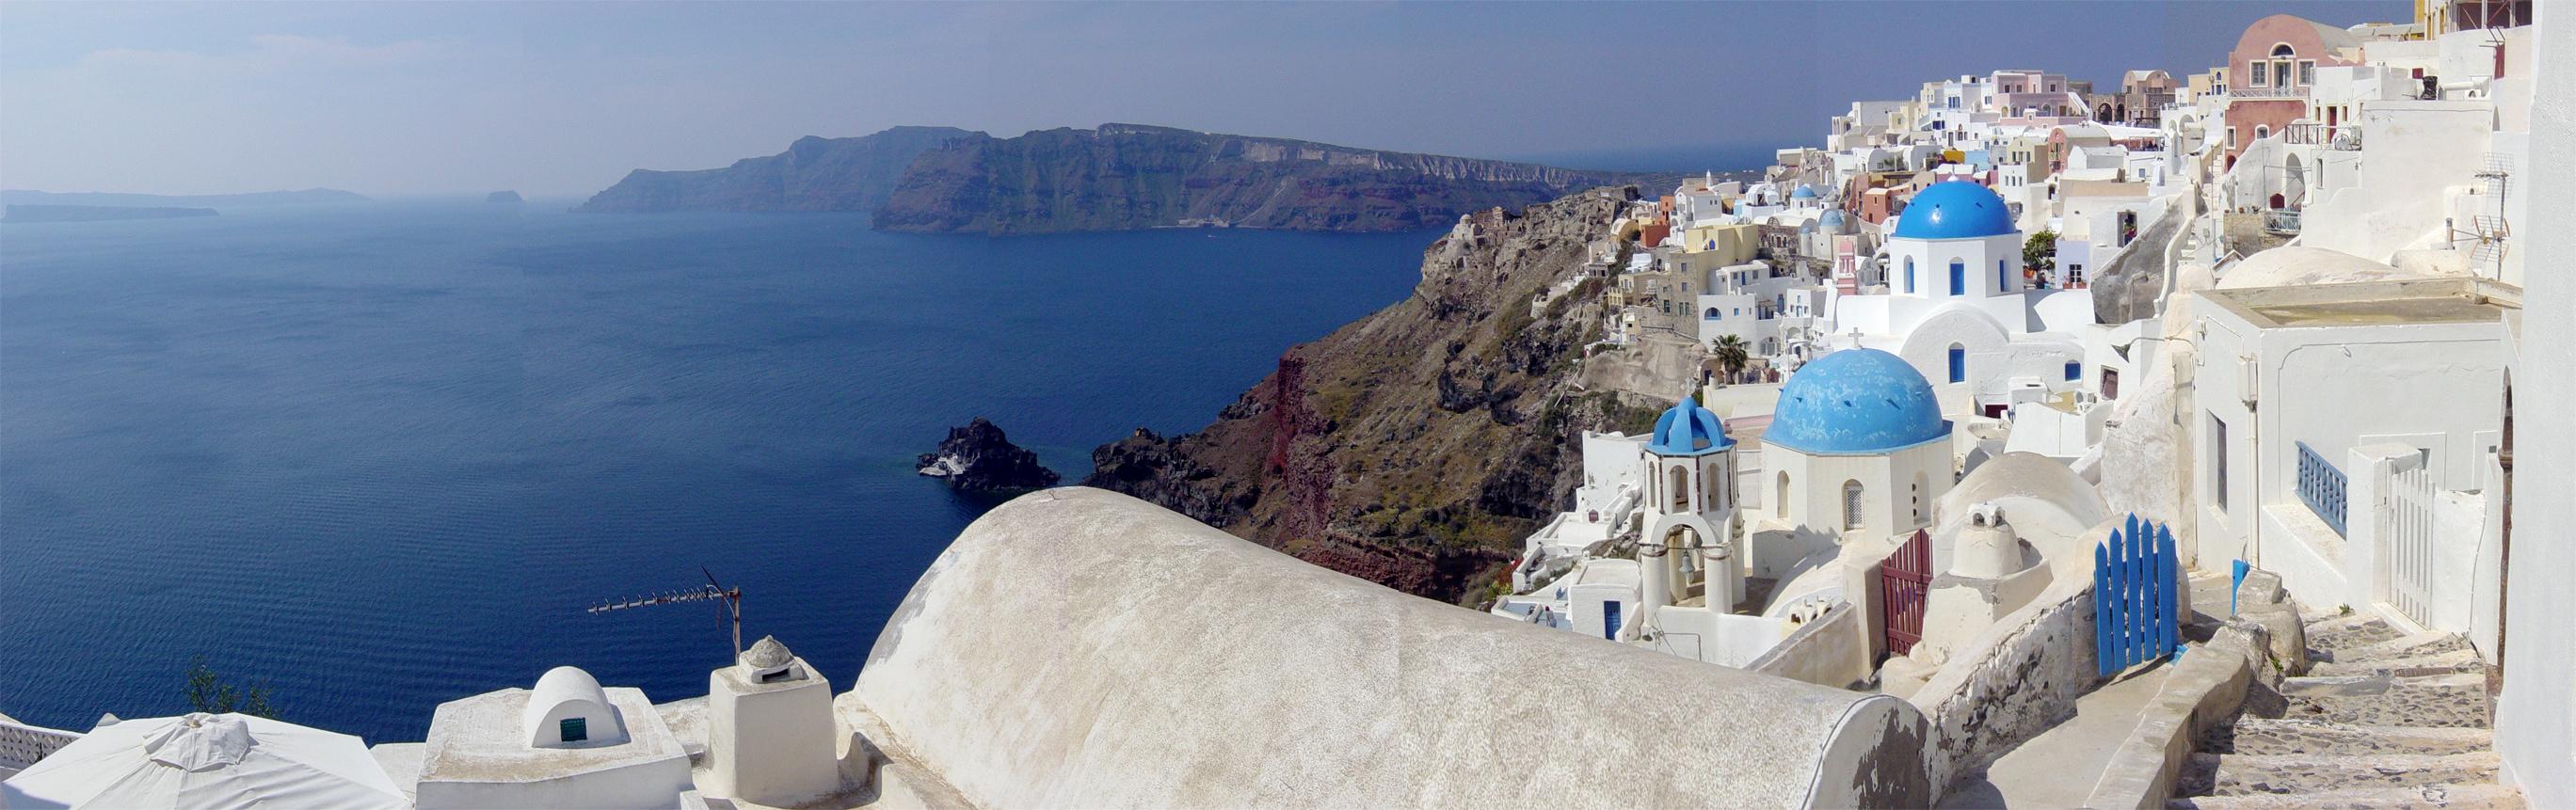 SantoriniPartialPano - Греция Санторини